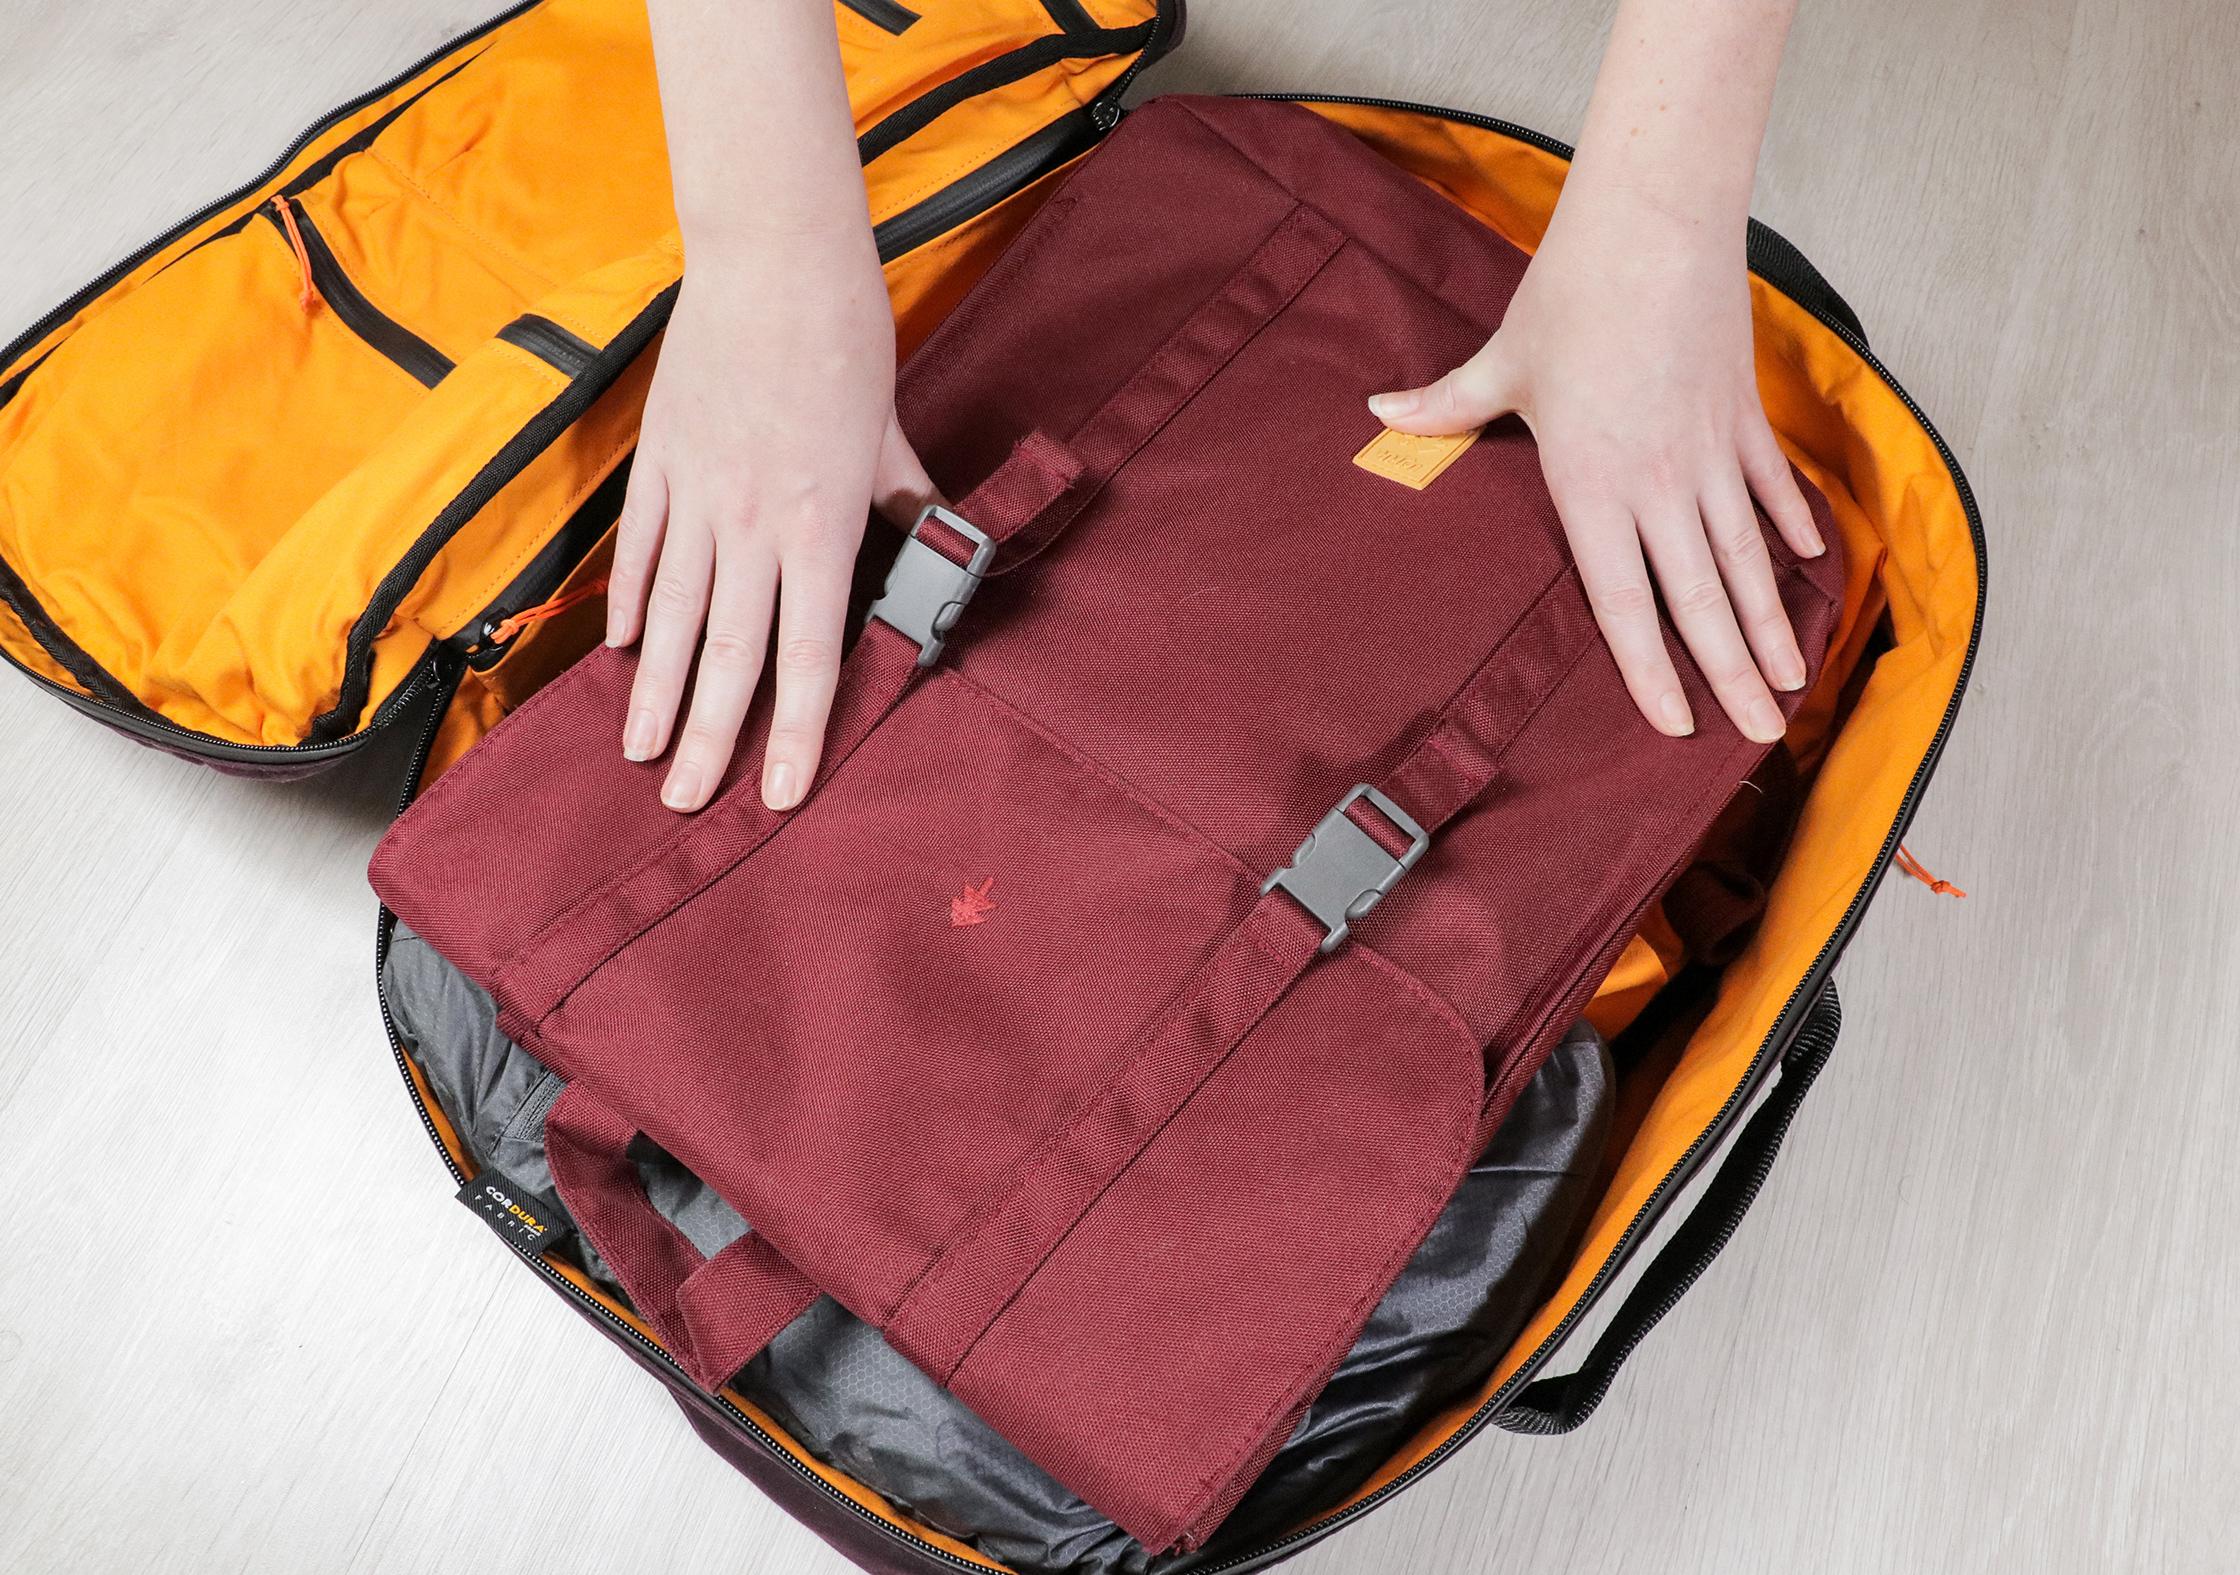 Lefrik Handy Backpack Inside The 30L Trakke Storr